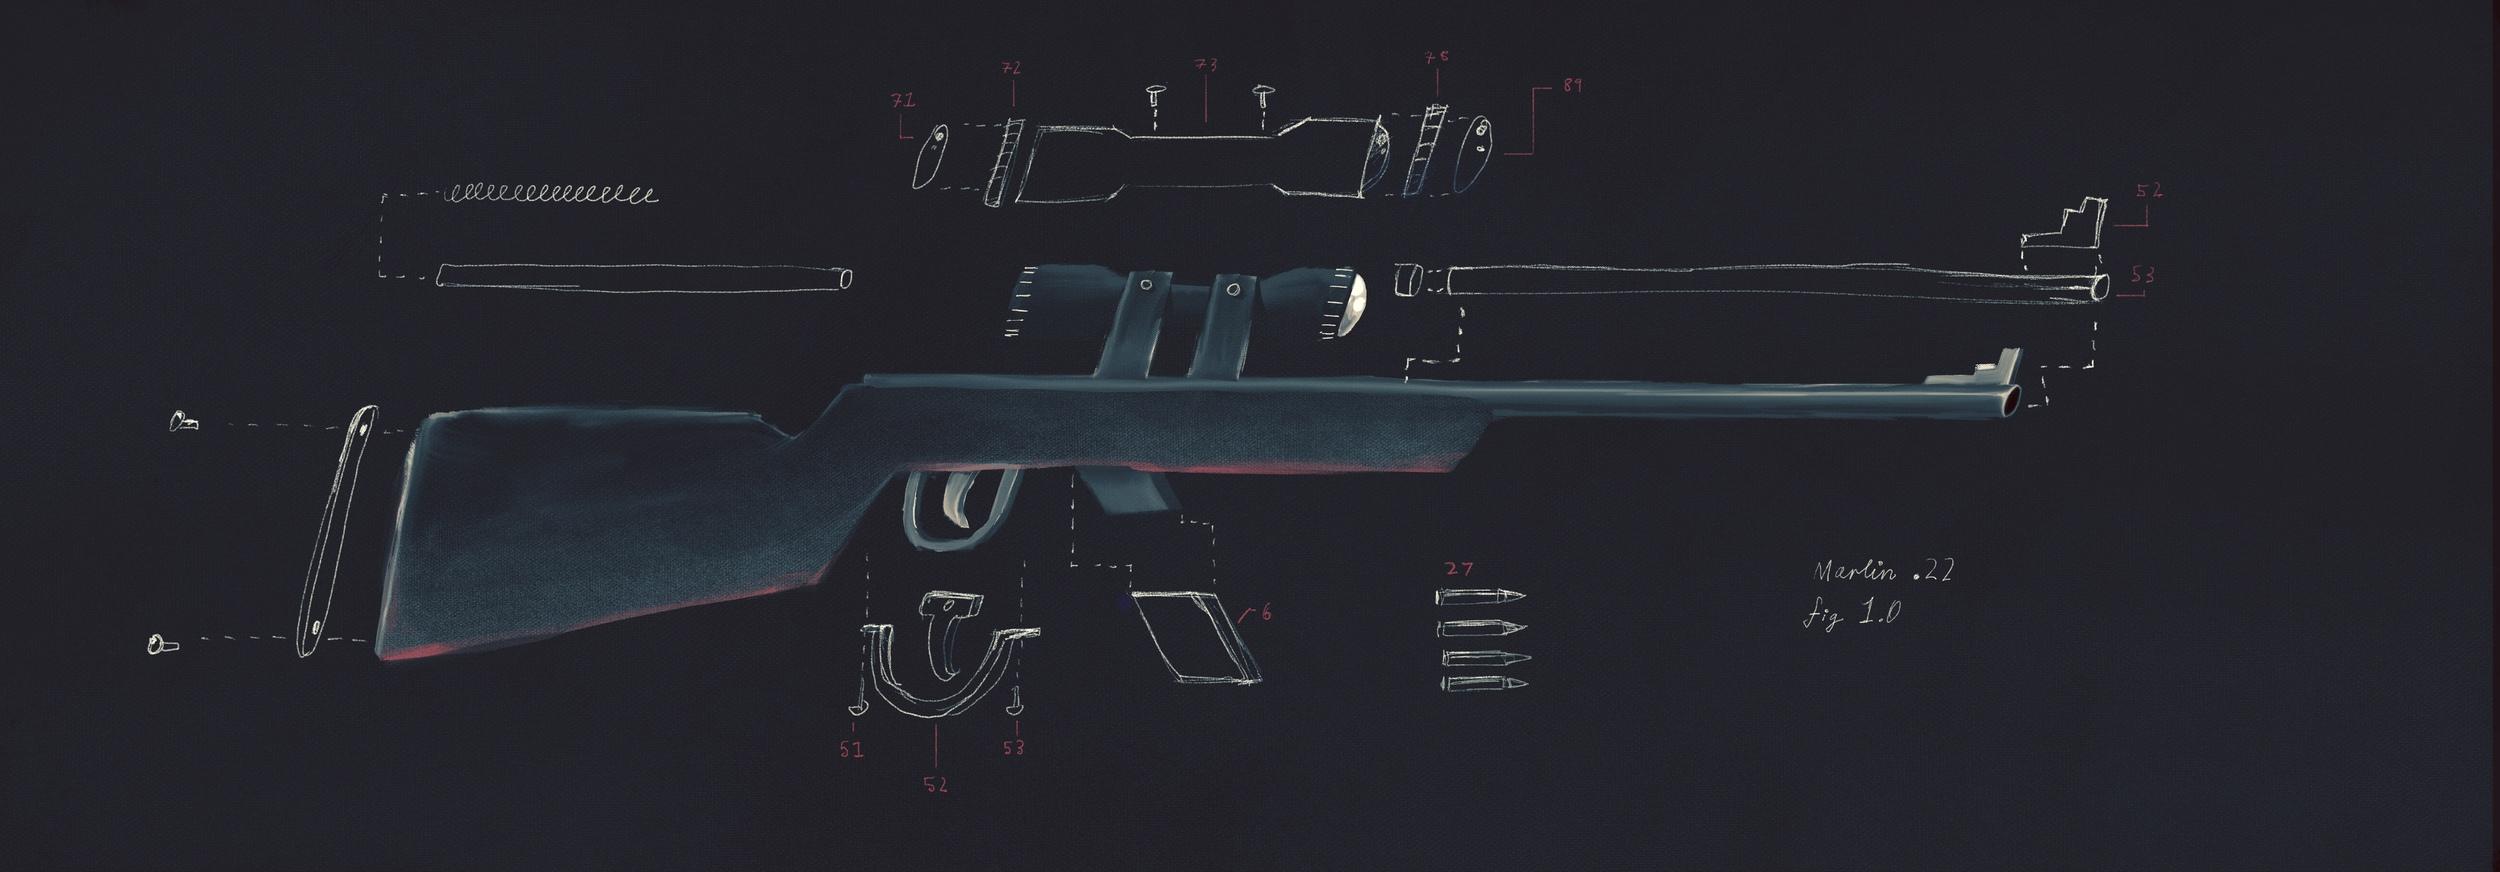 23_Rifle.jpg